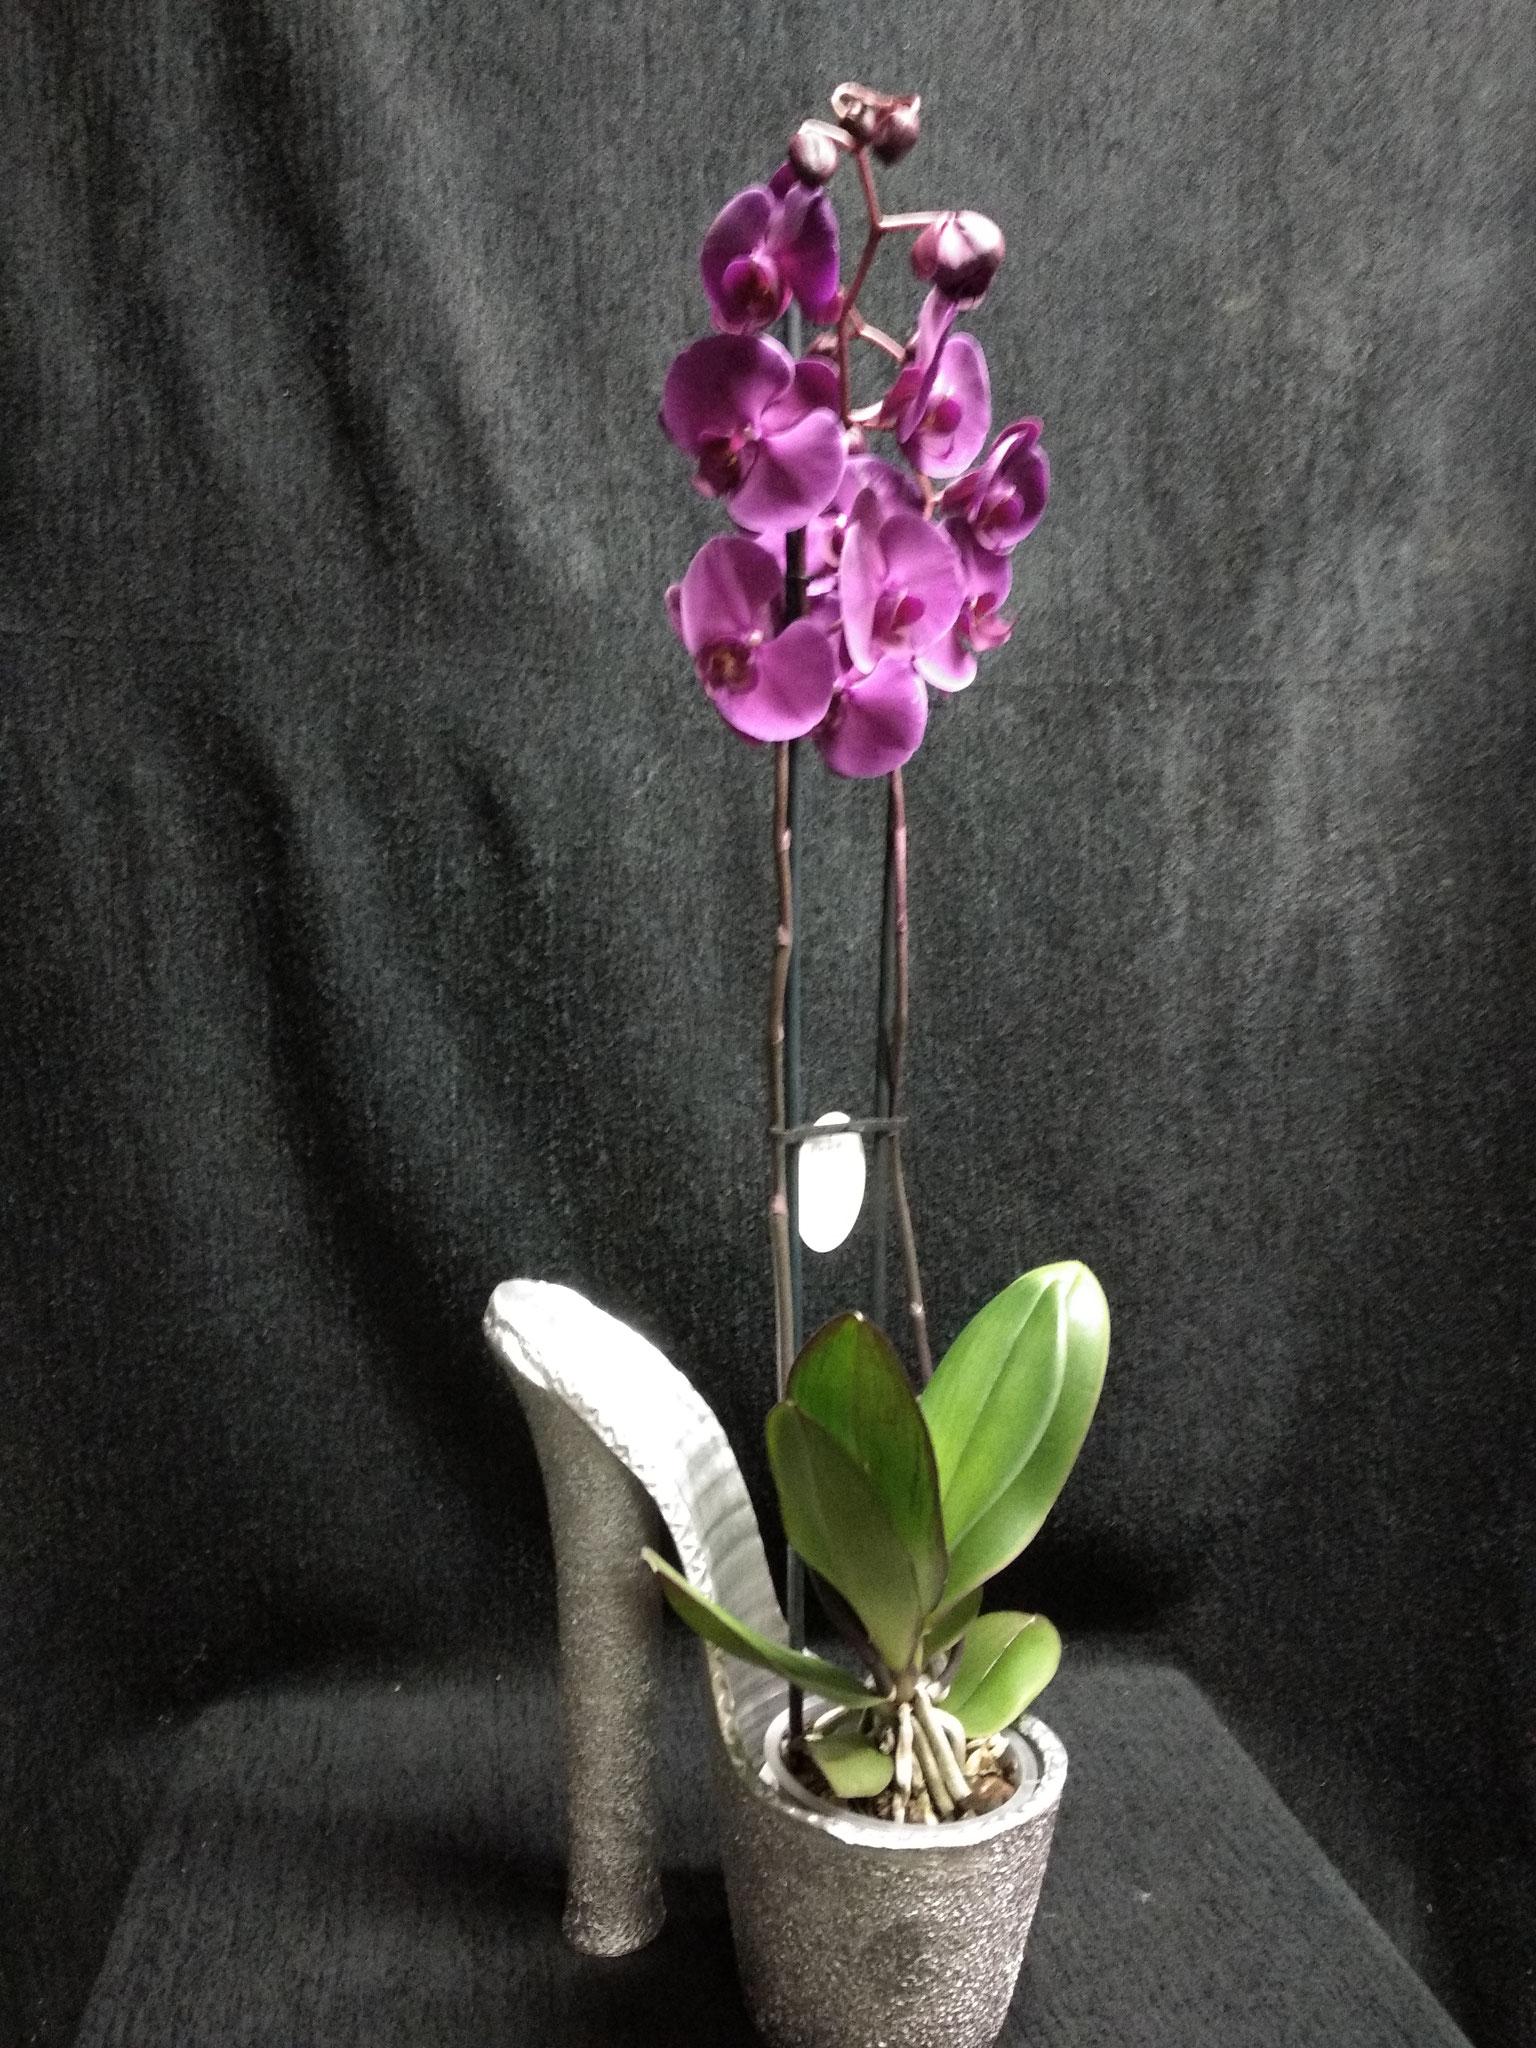 Orquidea Phalaenopsis en base decorativa zapato de plataforma